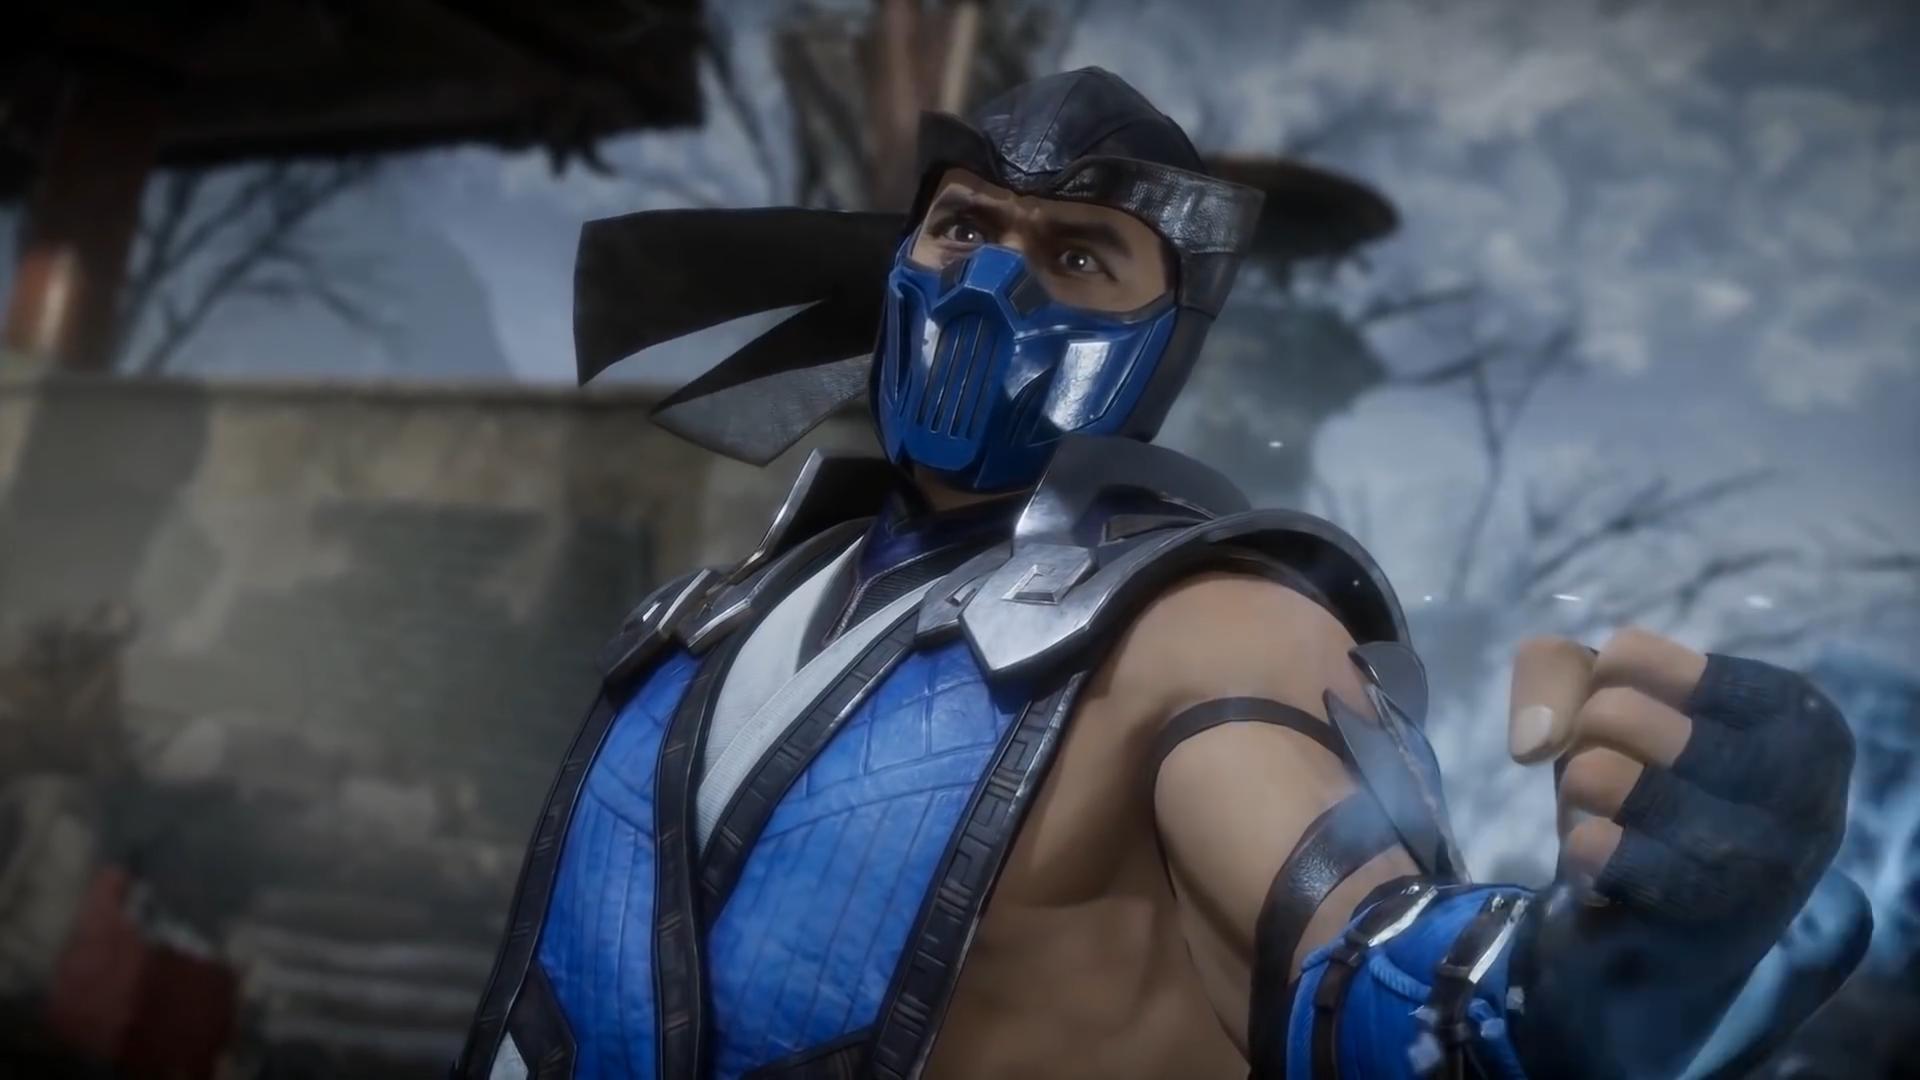 IMG_20190121_193255.164.jpg - Mortal Kombat 11